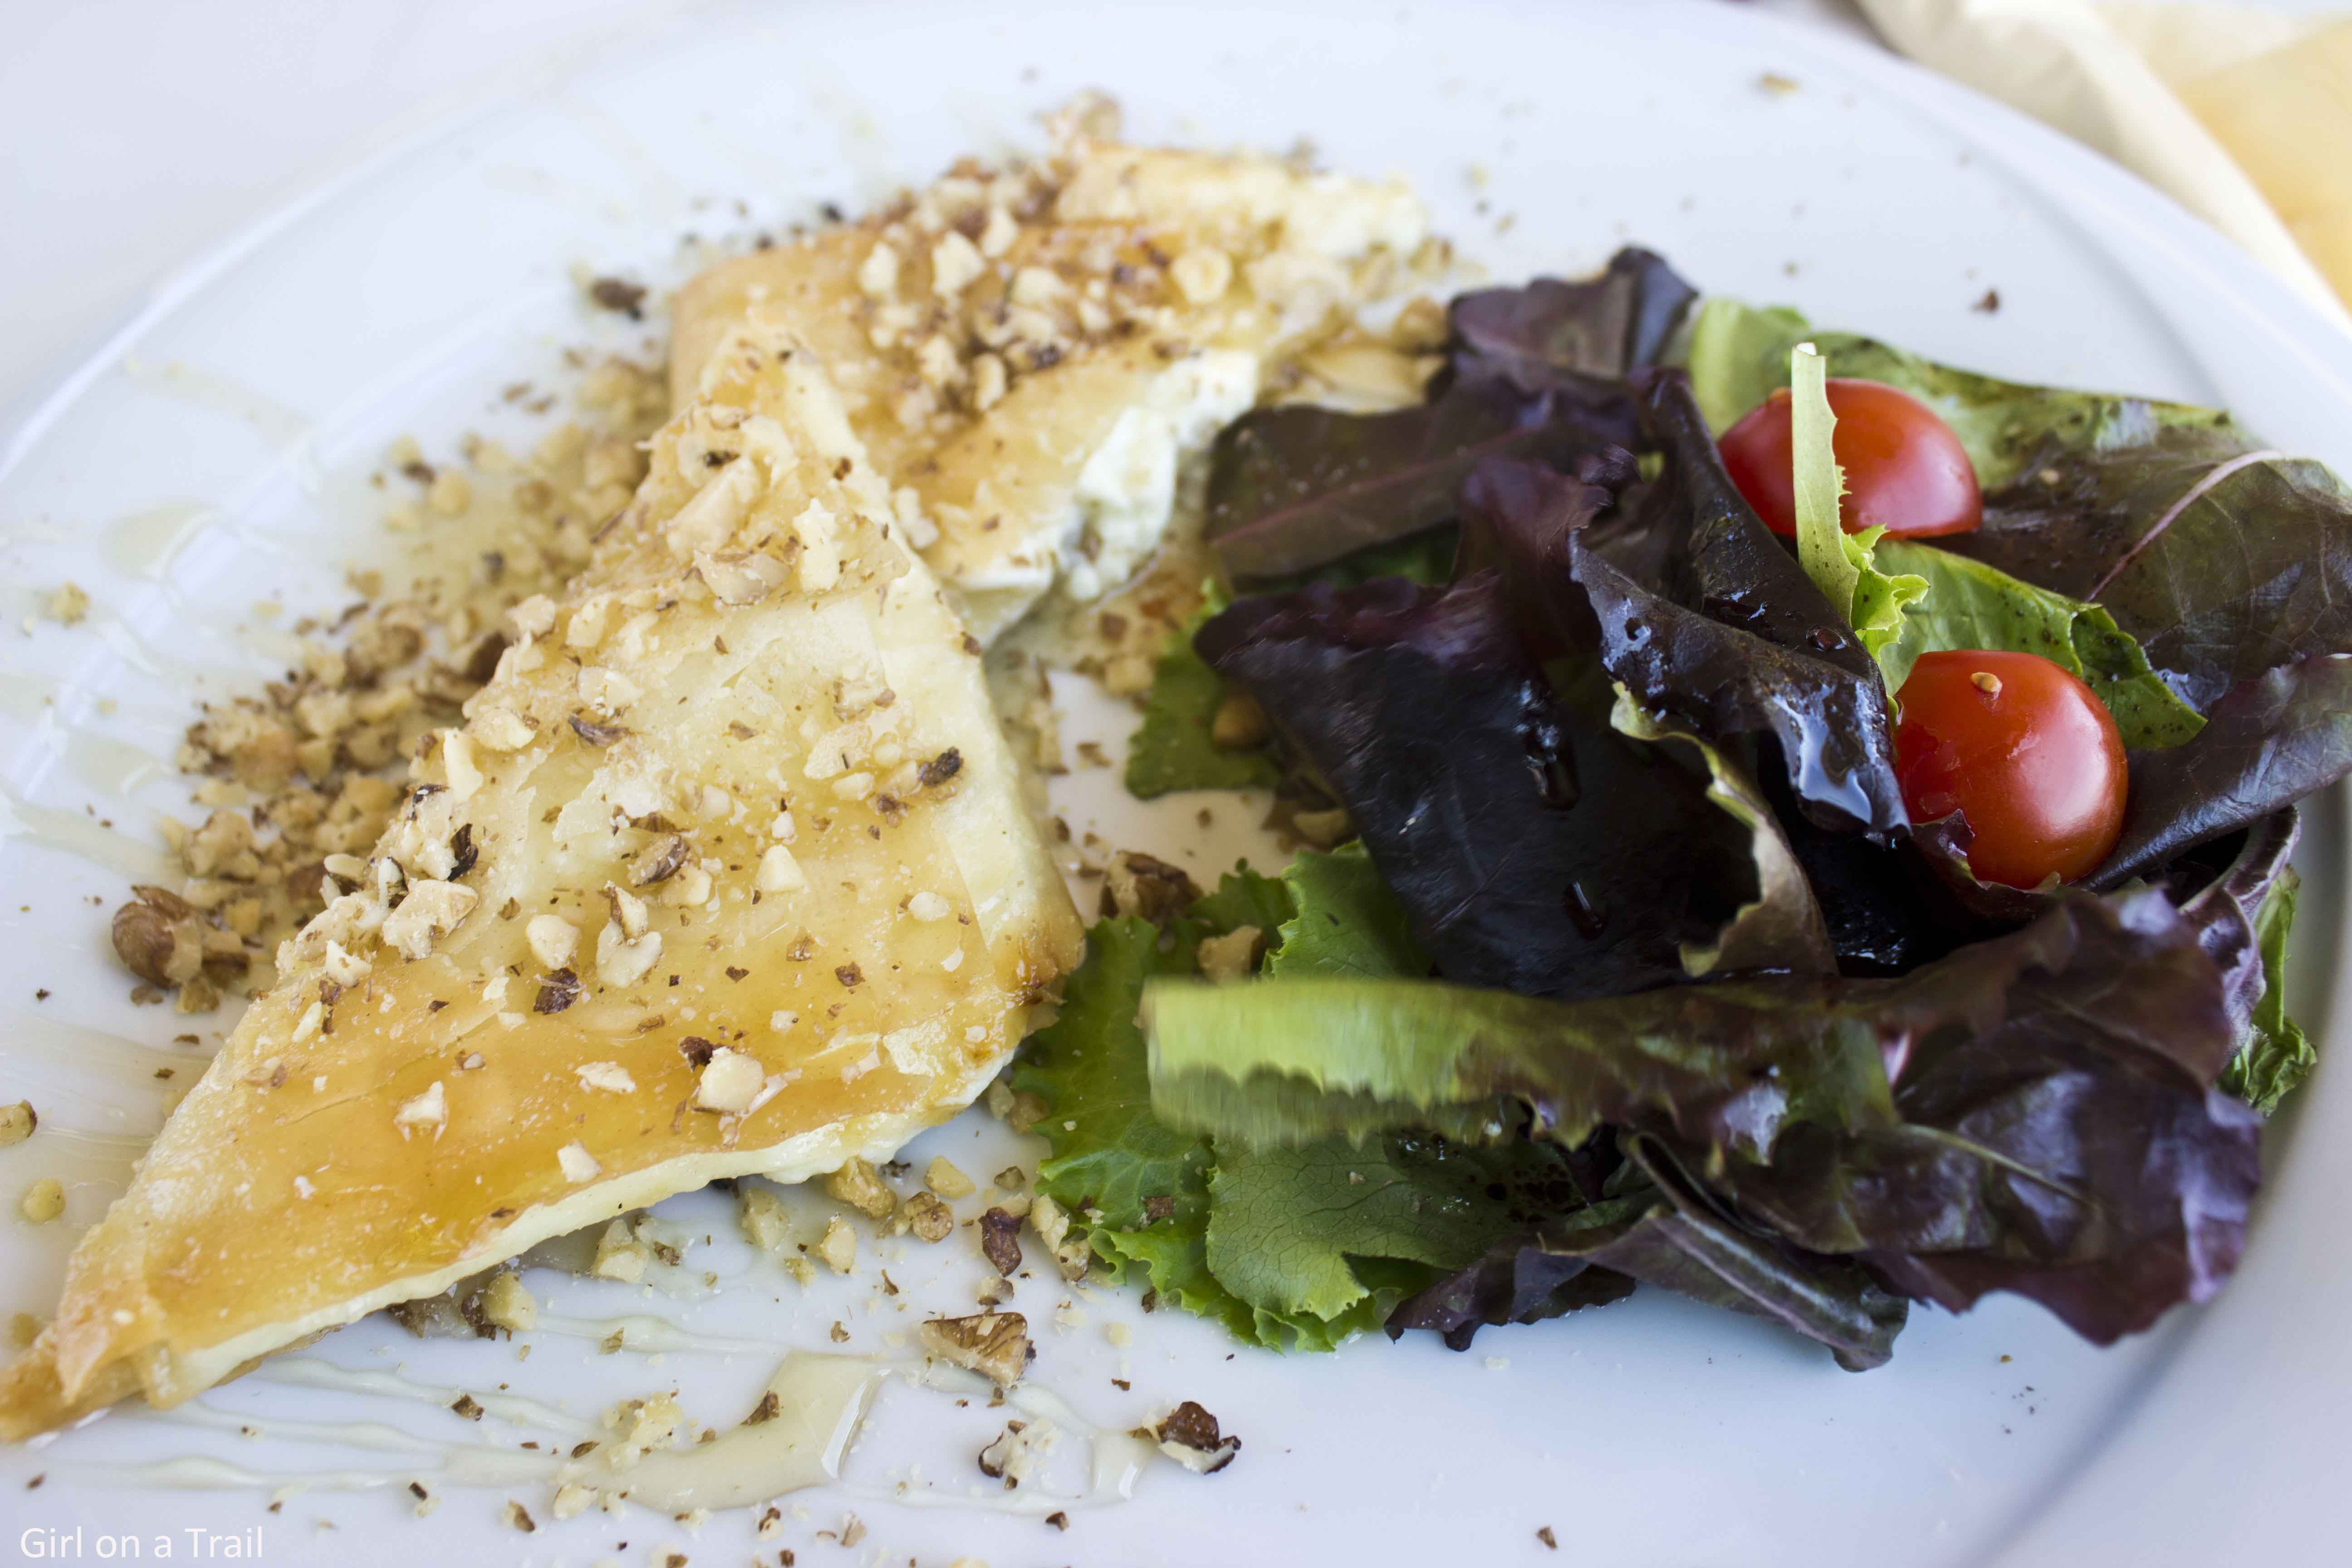 Corfu cuisine – kumquats, sofrito, stifado…